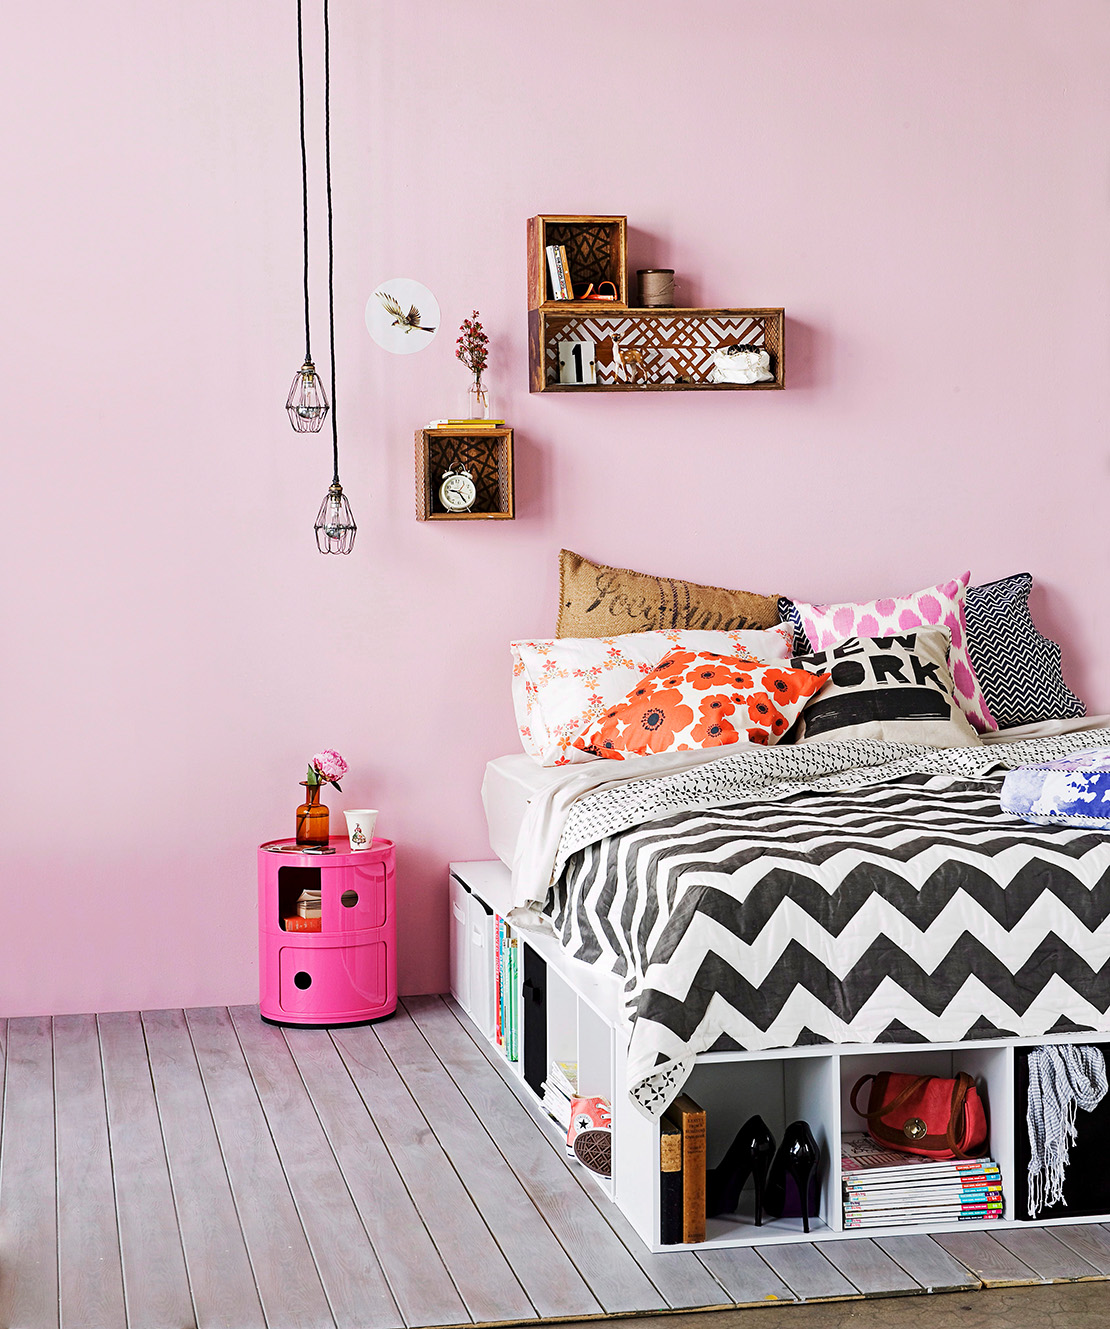 maedchenzimmer-rosa